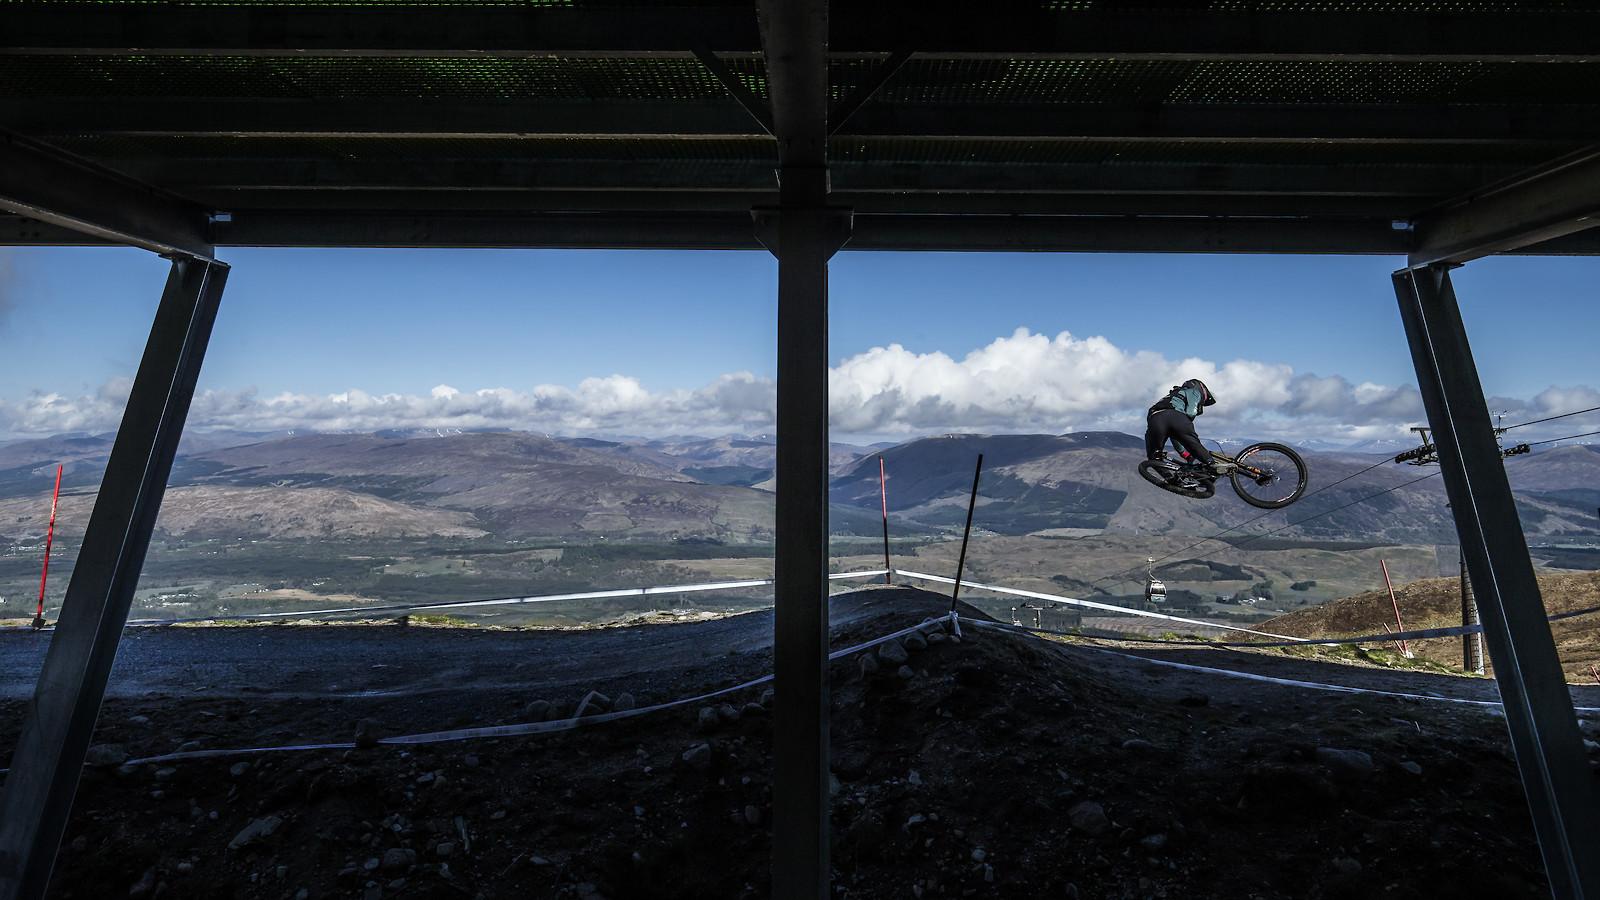 2 - phunkt.com - Mountain Biking Pictures - Vital MTB